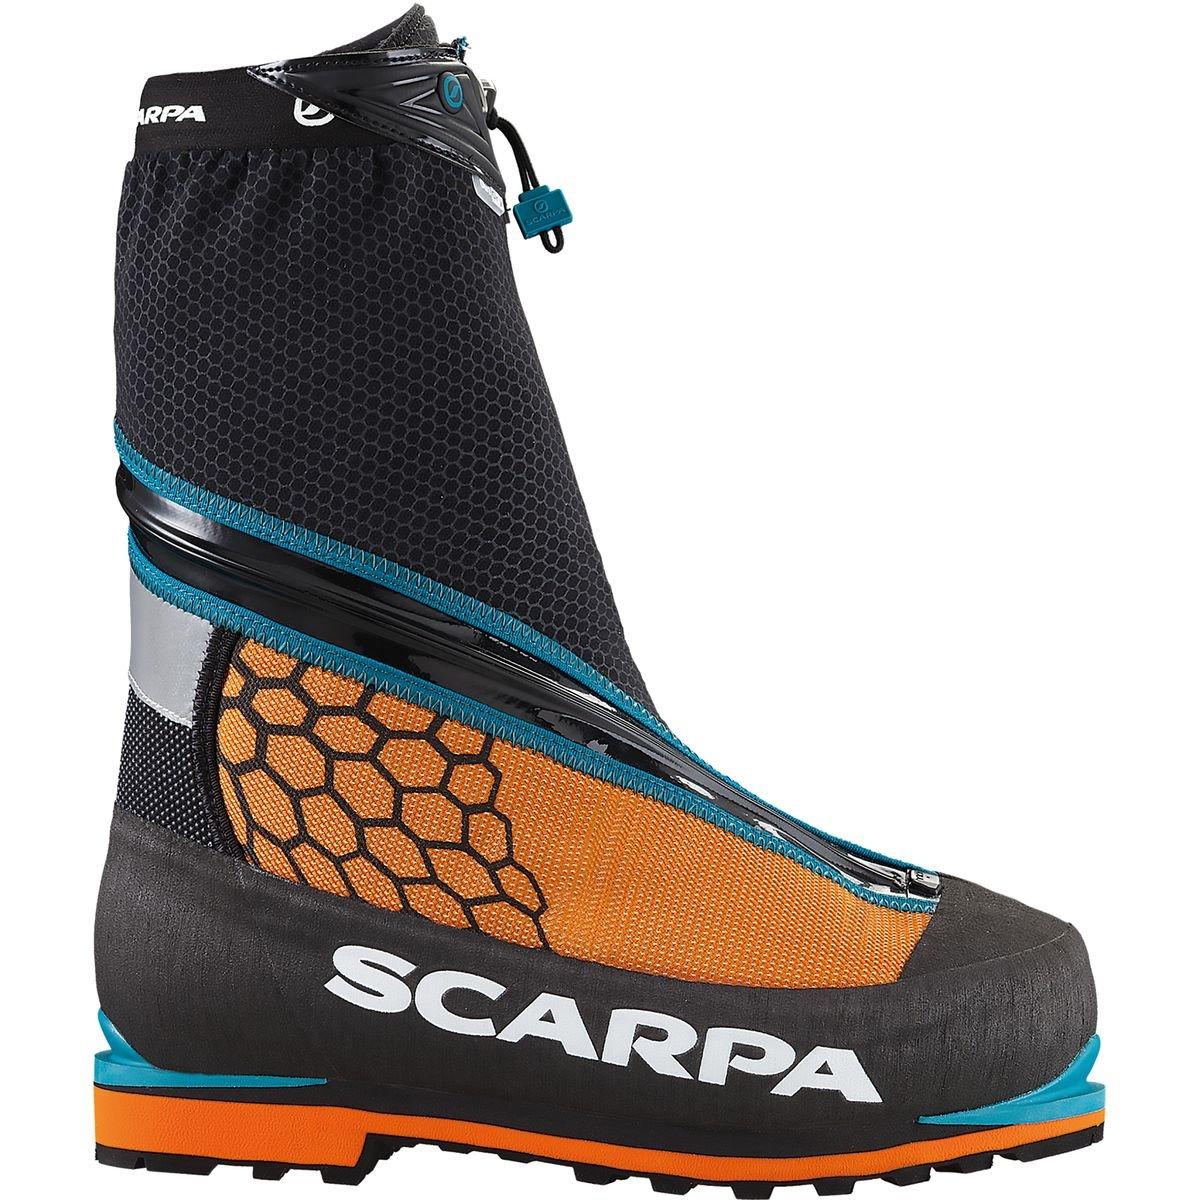 Scarpa Phantom 6000 Mountaineering Boot, Black/Orange, 41 EU/8 M US